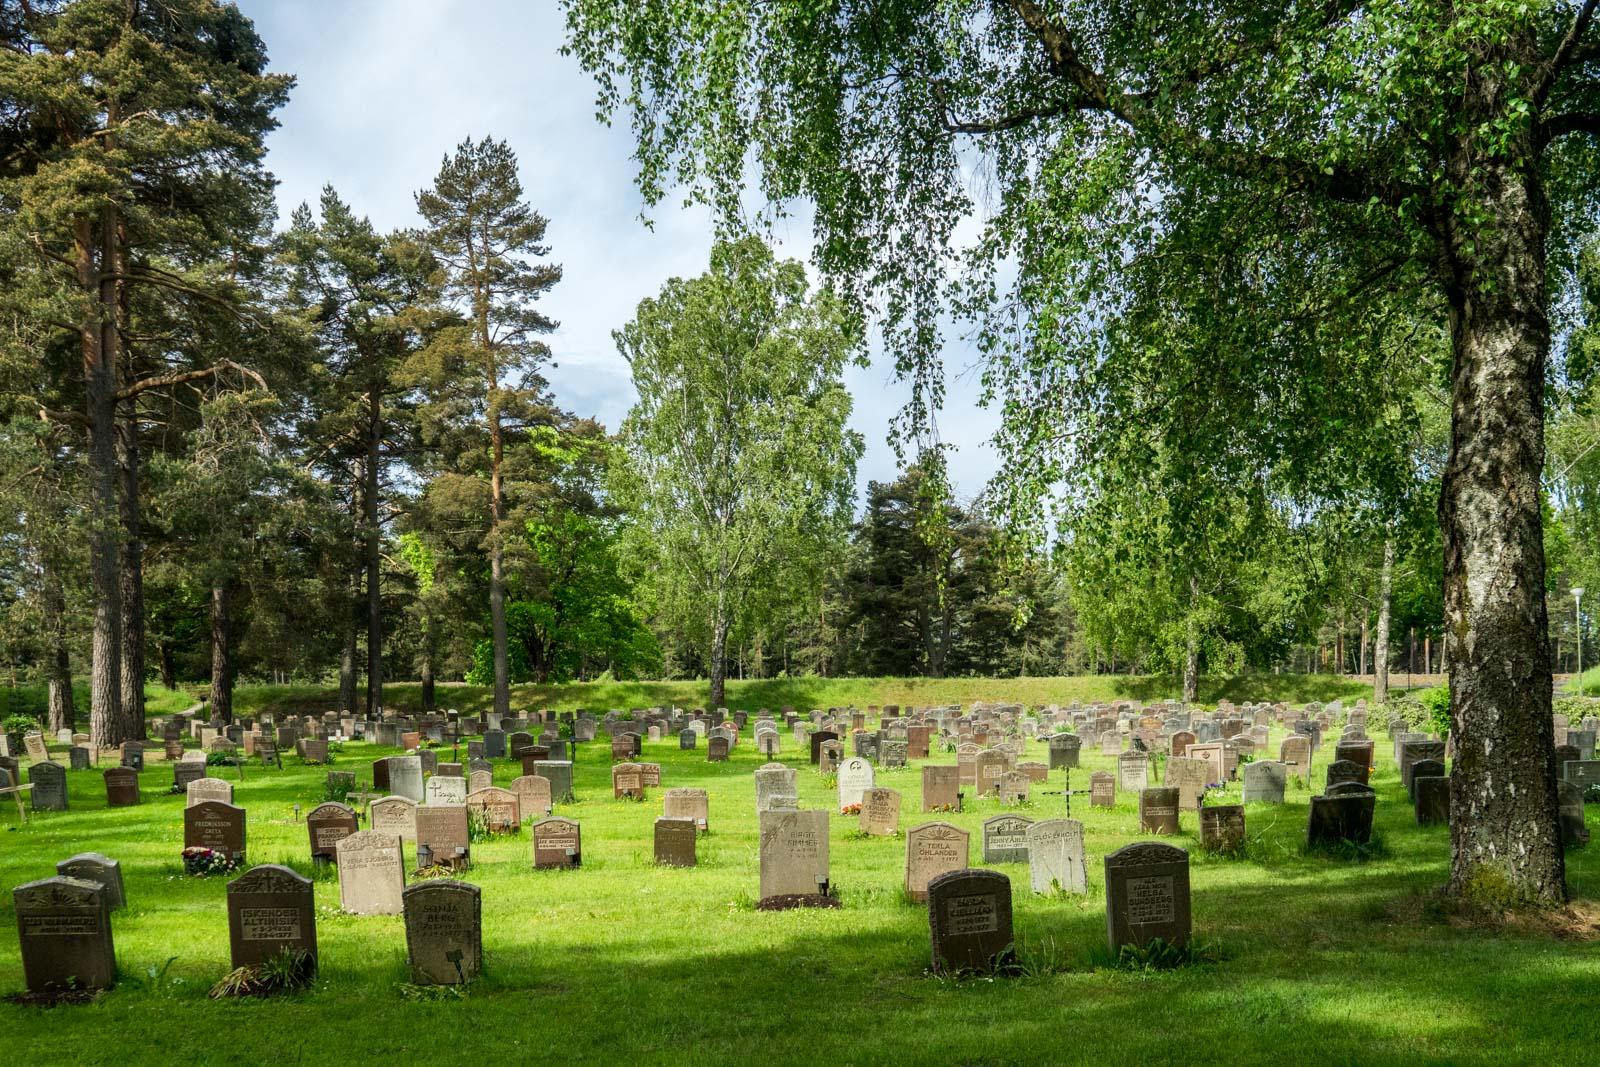 Skogskyrkogarden The Woodland Cemetery in Stockholm Sweden